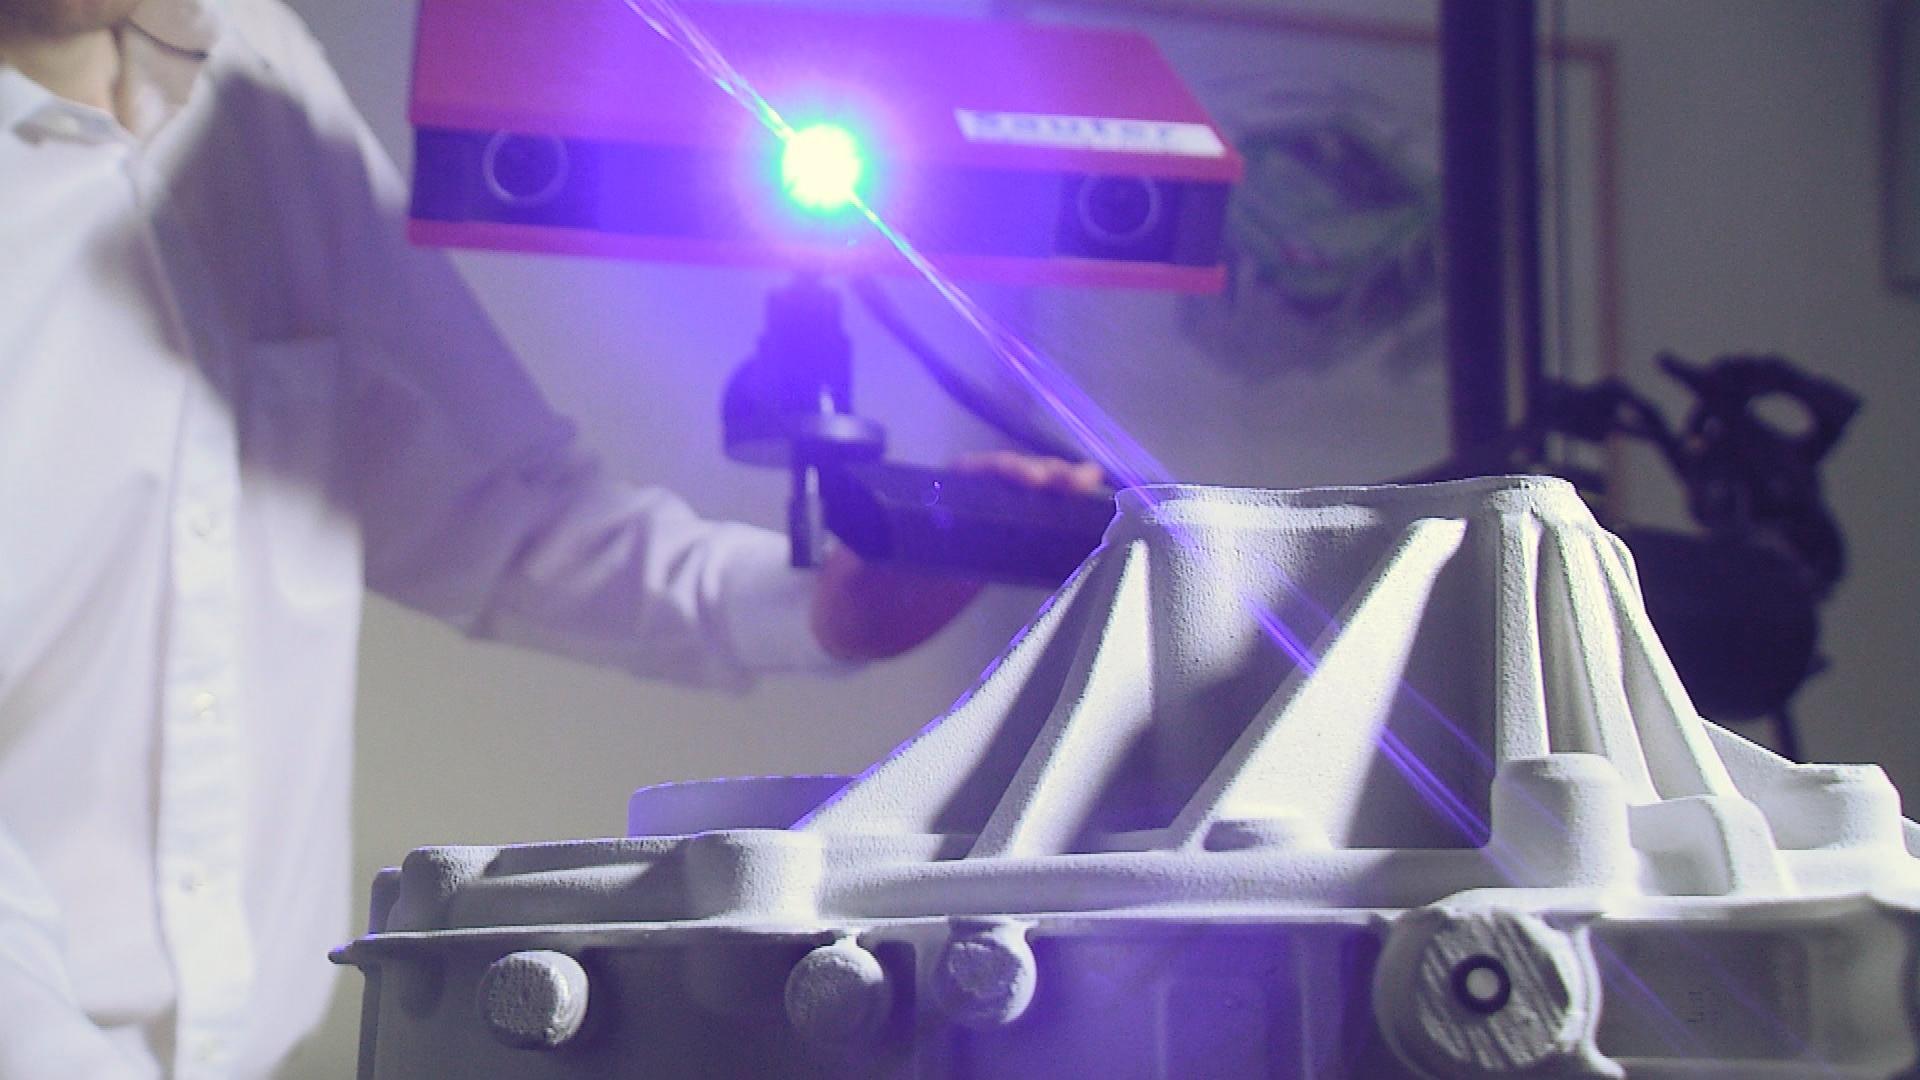 Sauter_Engineering+Design_Industrielle_Messtechnik-Geometrie+Material-Inspection-001